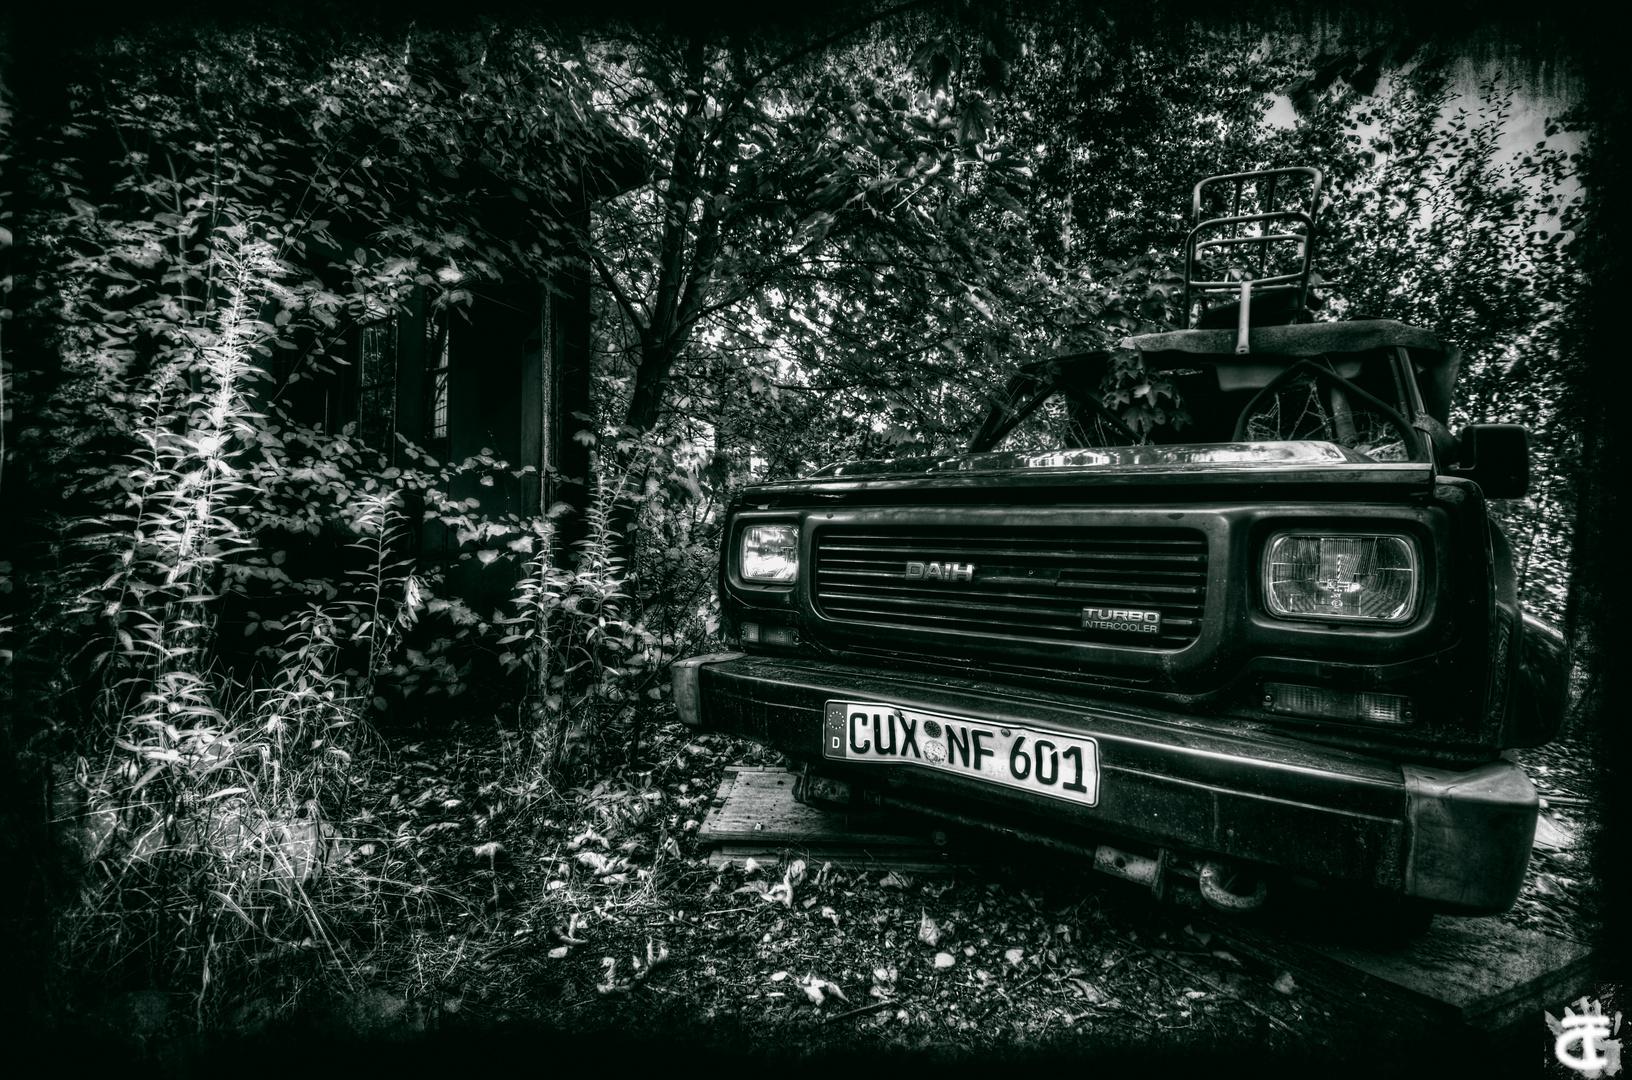 Jurrasic Park Thuringia